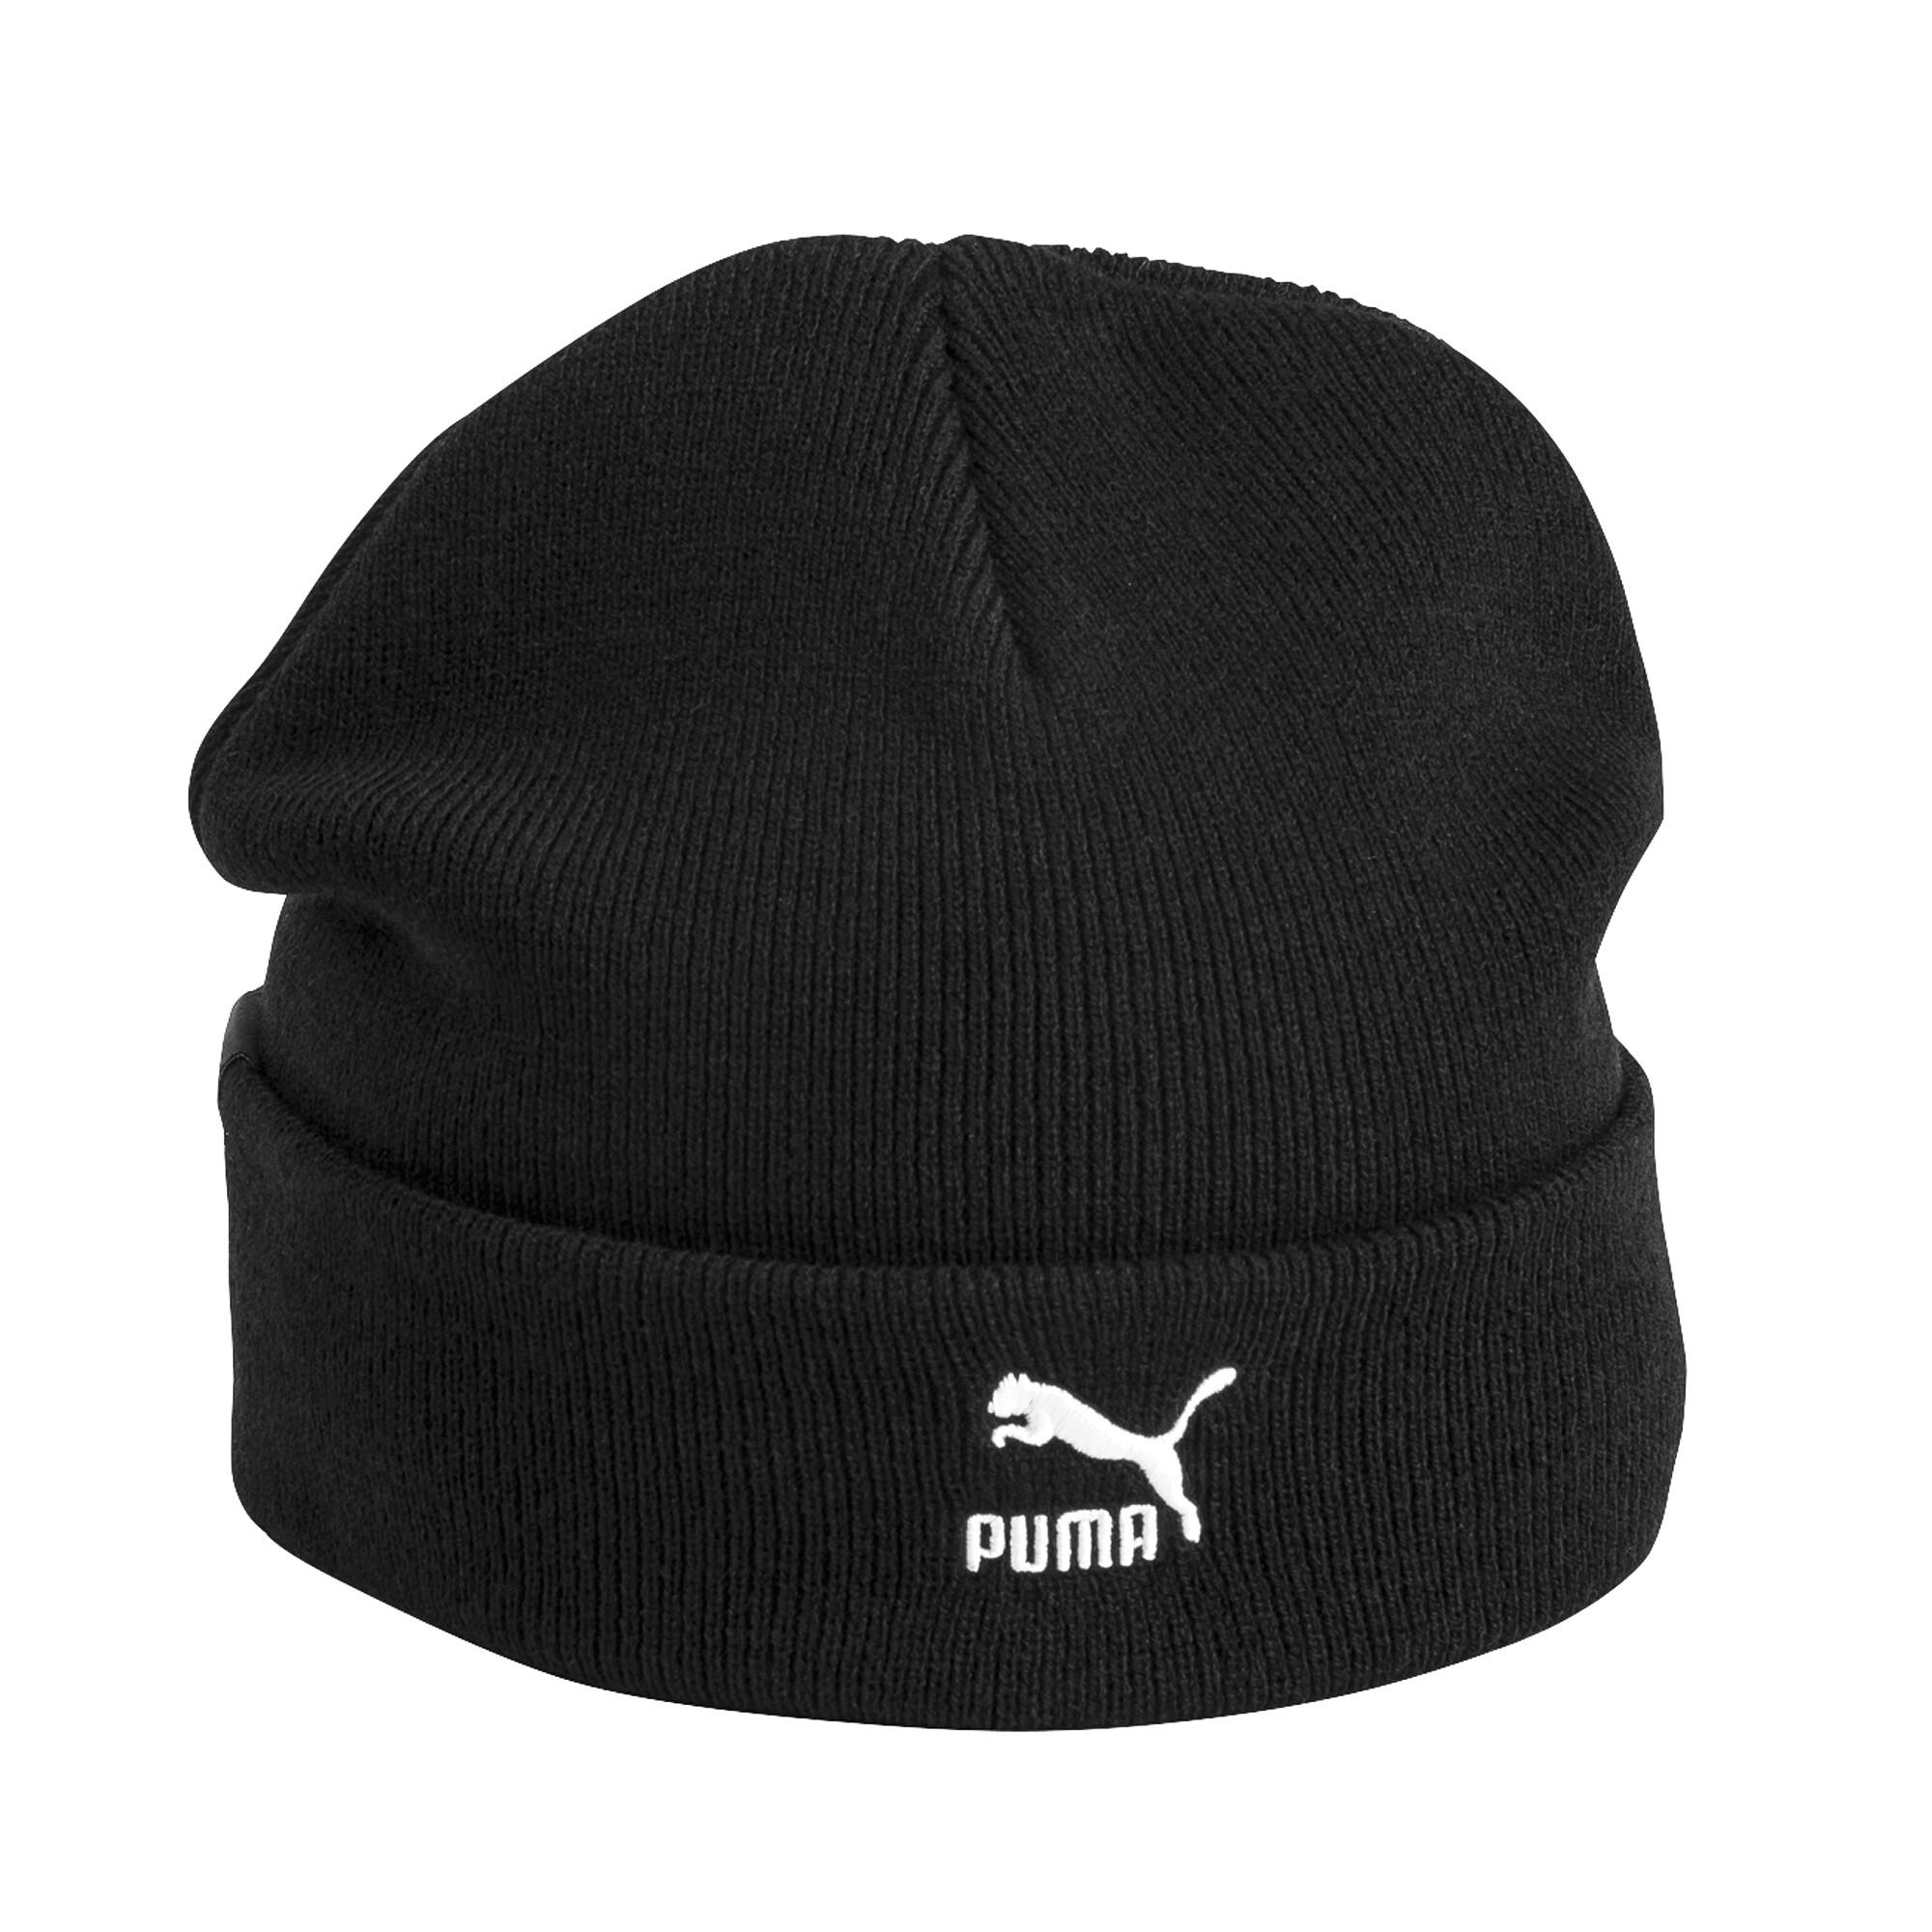 Archive Mid Fit Beanie, Puma Black, large